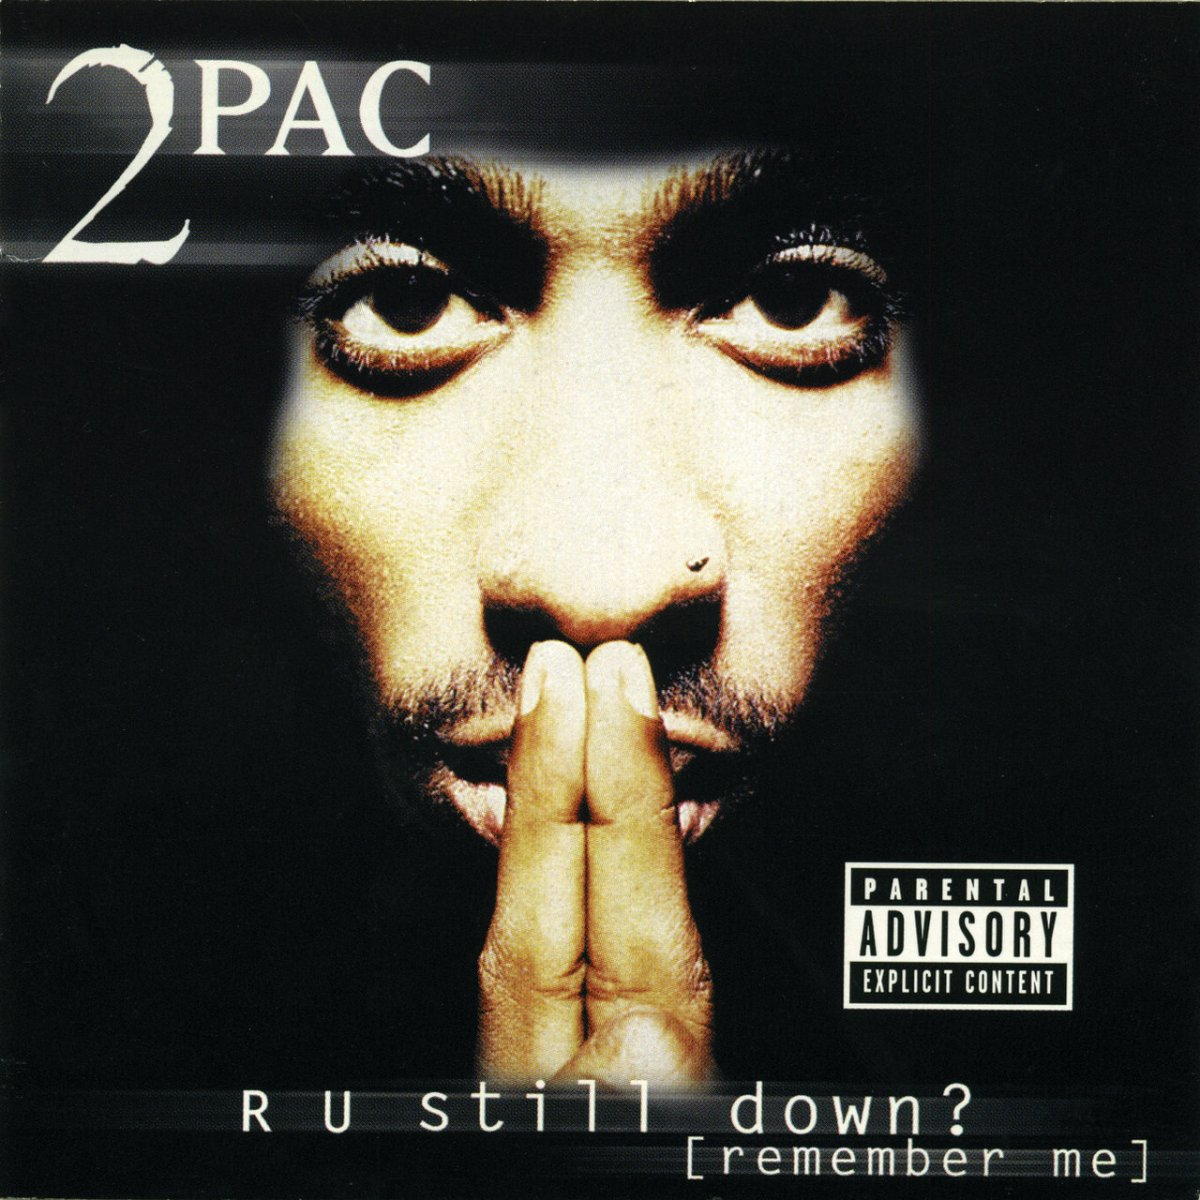 2Pac - R U Still Down? (Remember Me) (Cover)